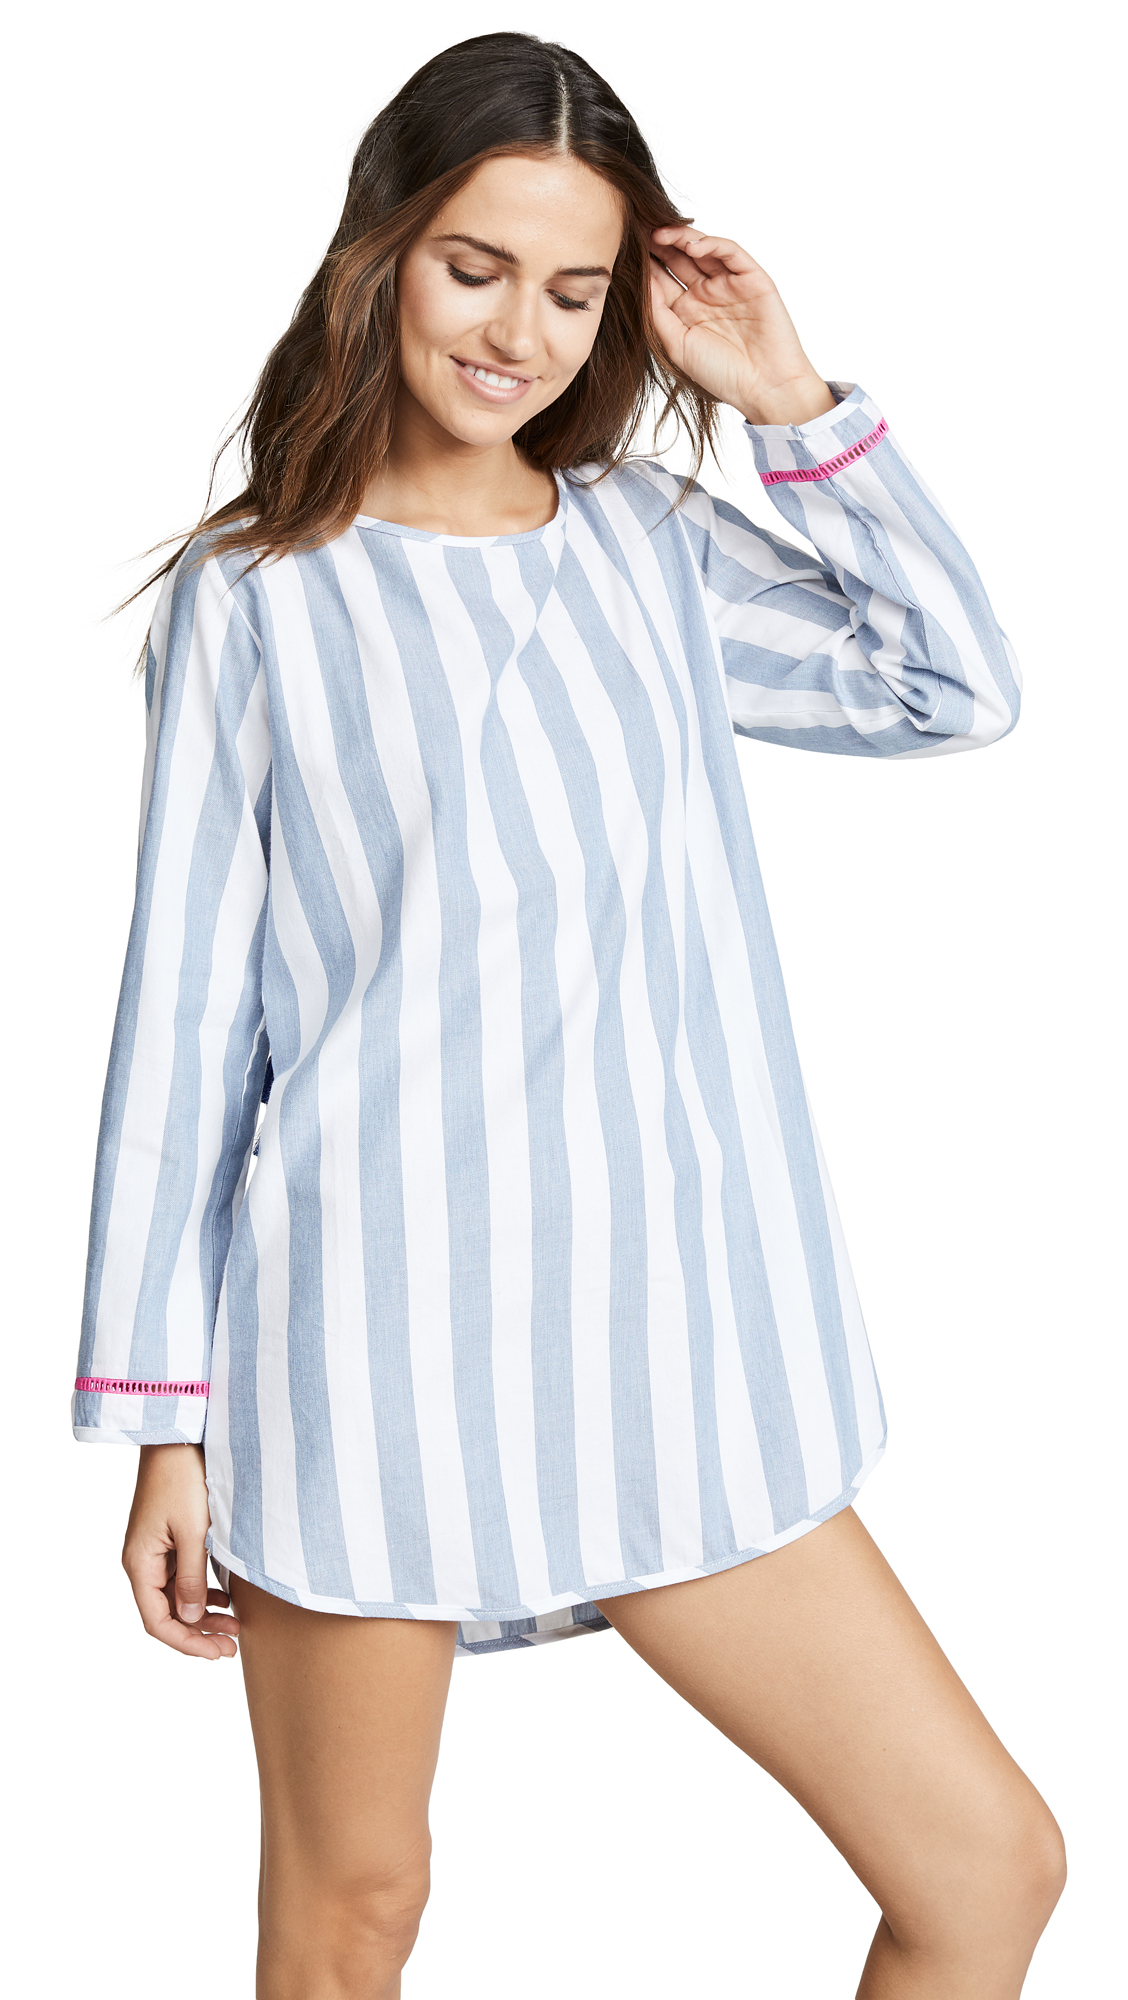 PLUSH Chambray Open Back Dress in Blue/White Stripe